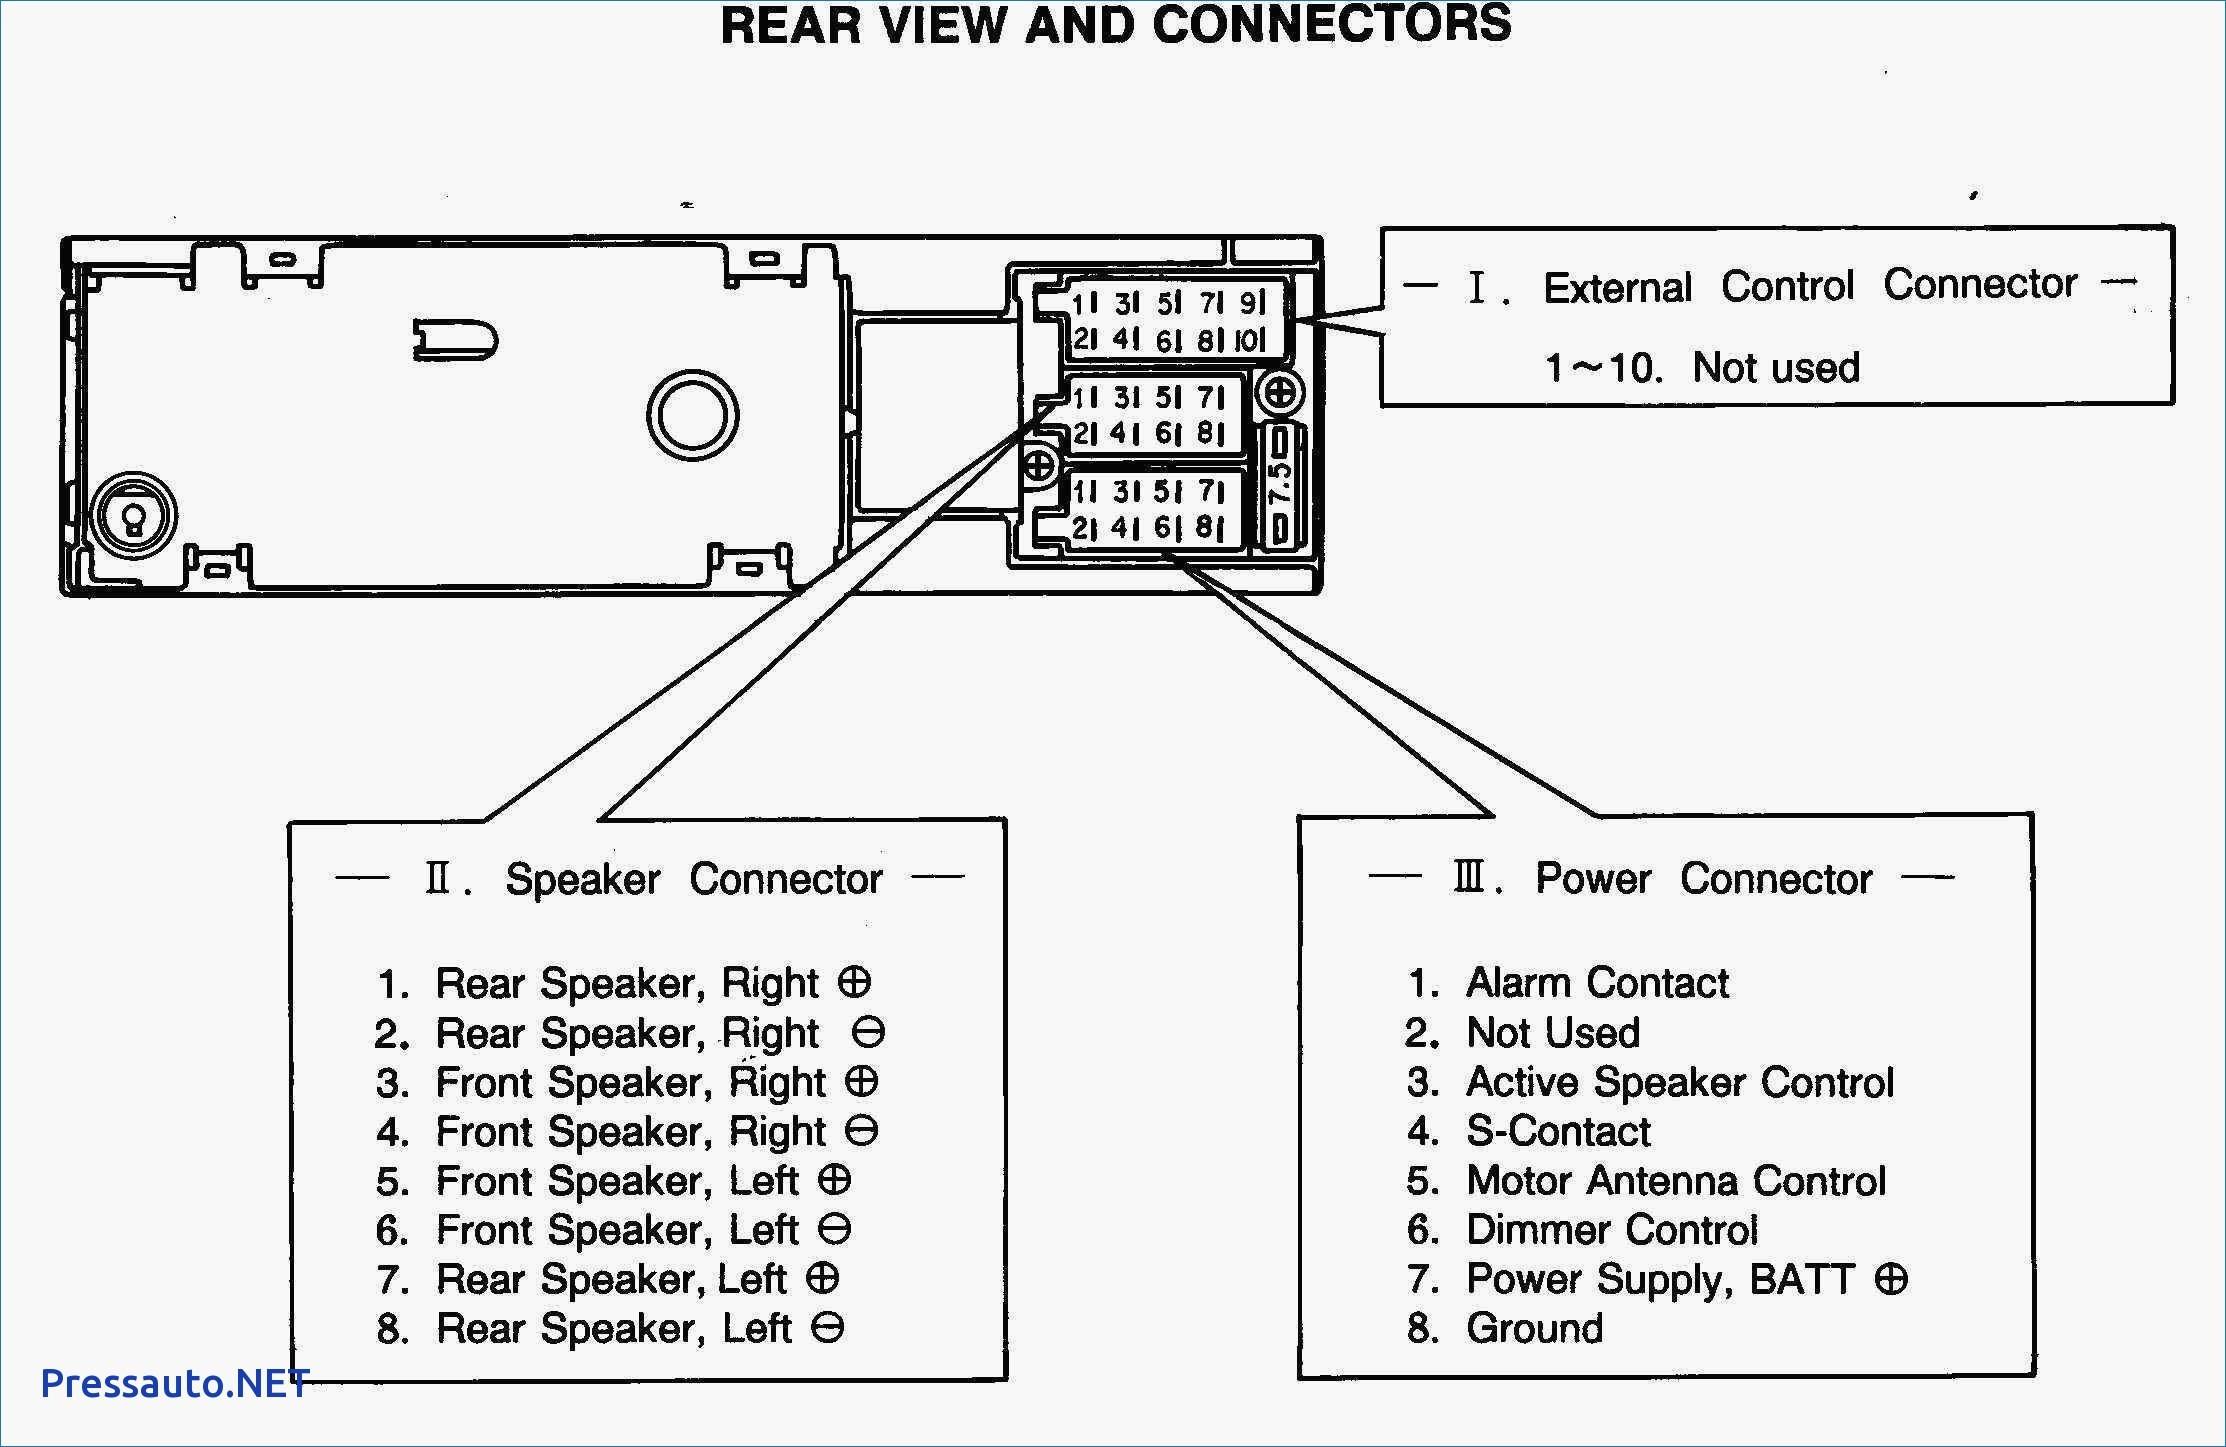 Car sound System Setup Diagram Car Diagram Awesome Kenwood Car Audio Wiring Diagram Image Ideas Of Car sound System Setup Diagram